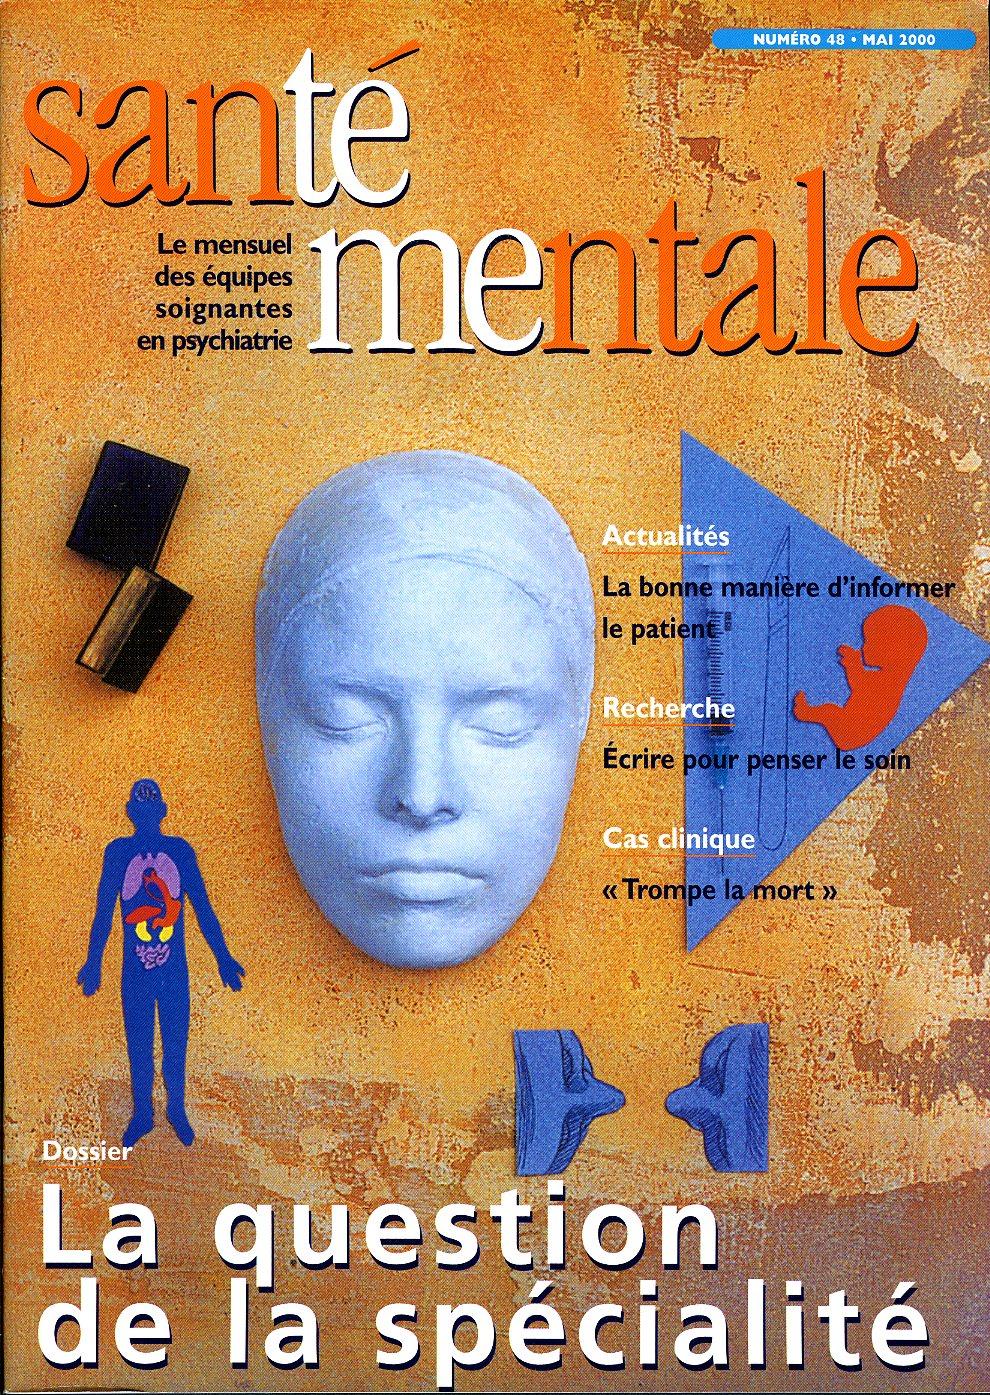 Couverture N°48 mai 2000